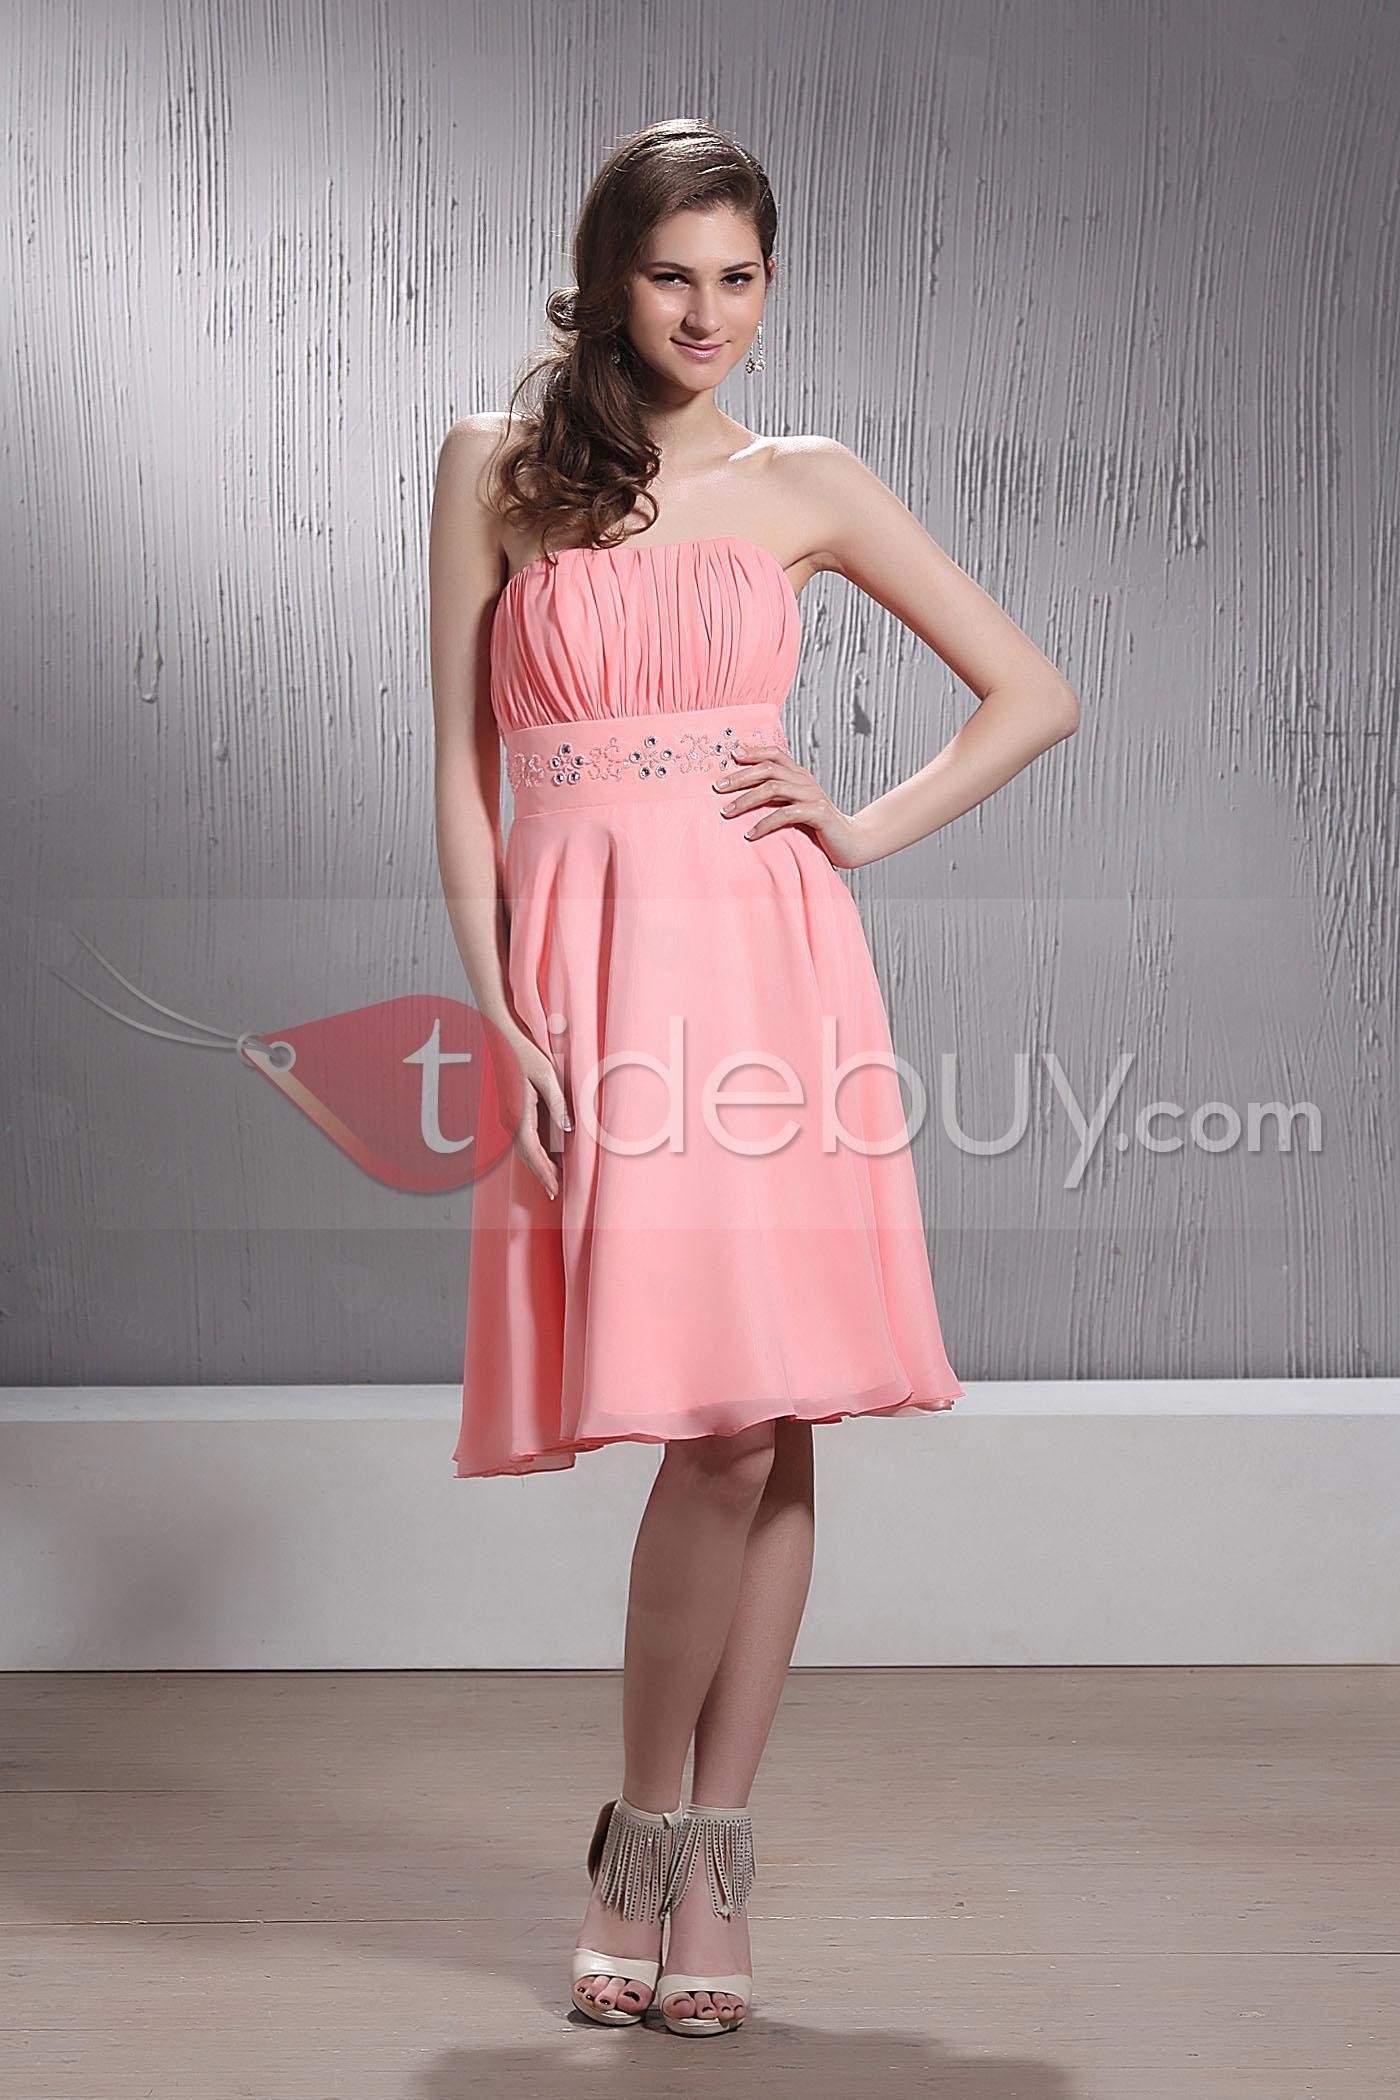 Pin de Eloïse Delorgne en vestidos de gala | Pinterest | Vestido de ...